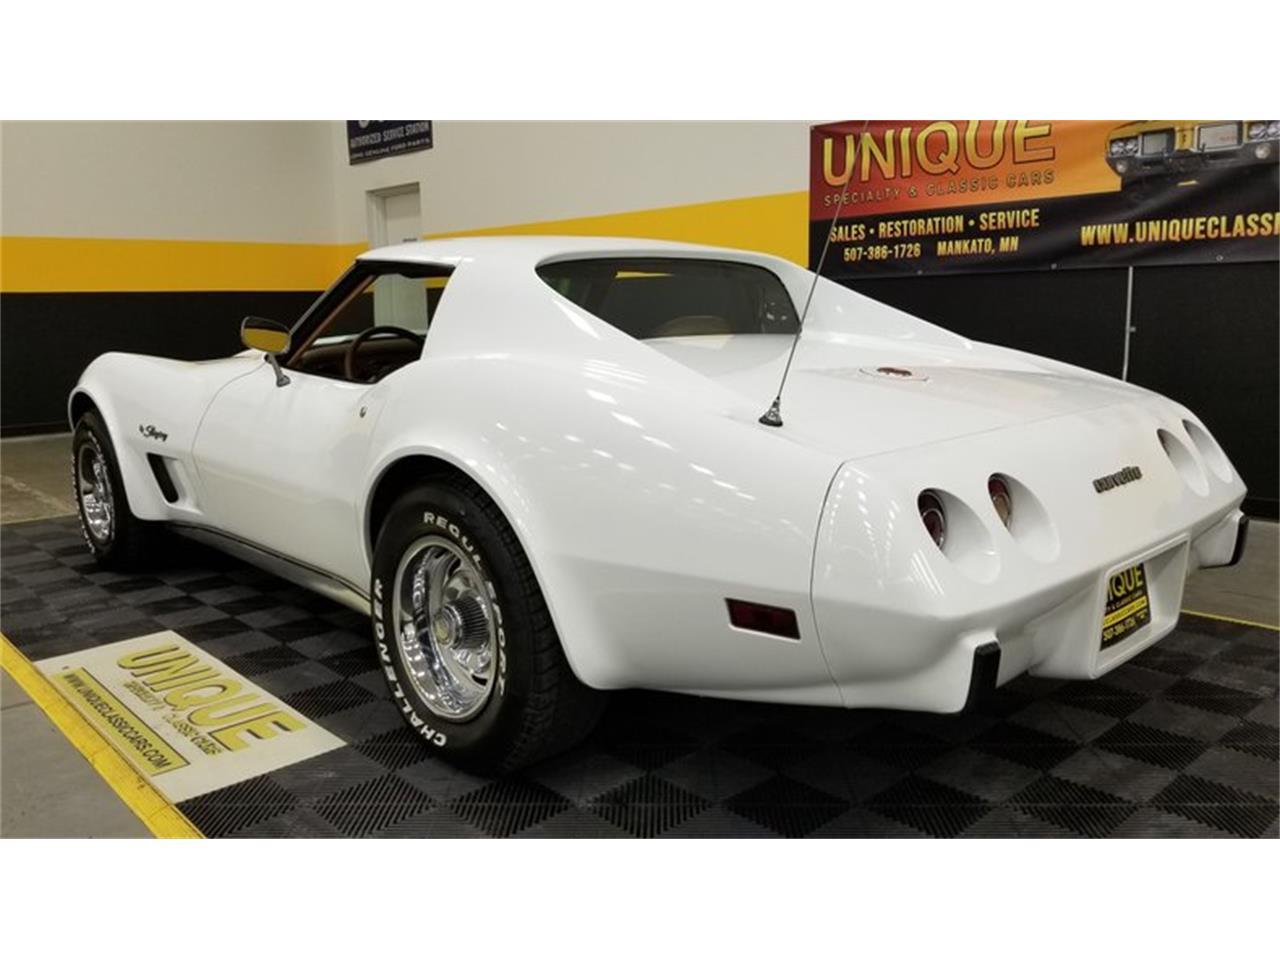 1976 Chevrolet Corvette (CC-1379163) for sale in Mankato, Minnesota